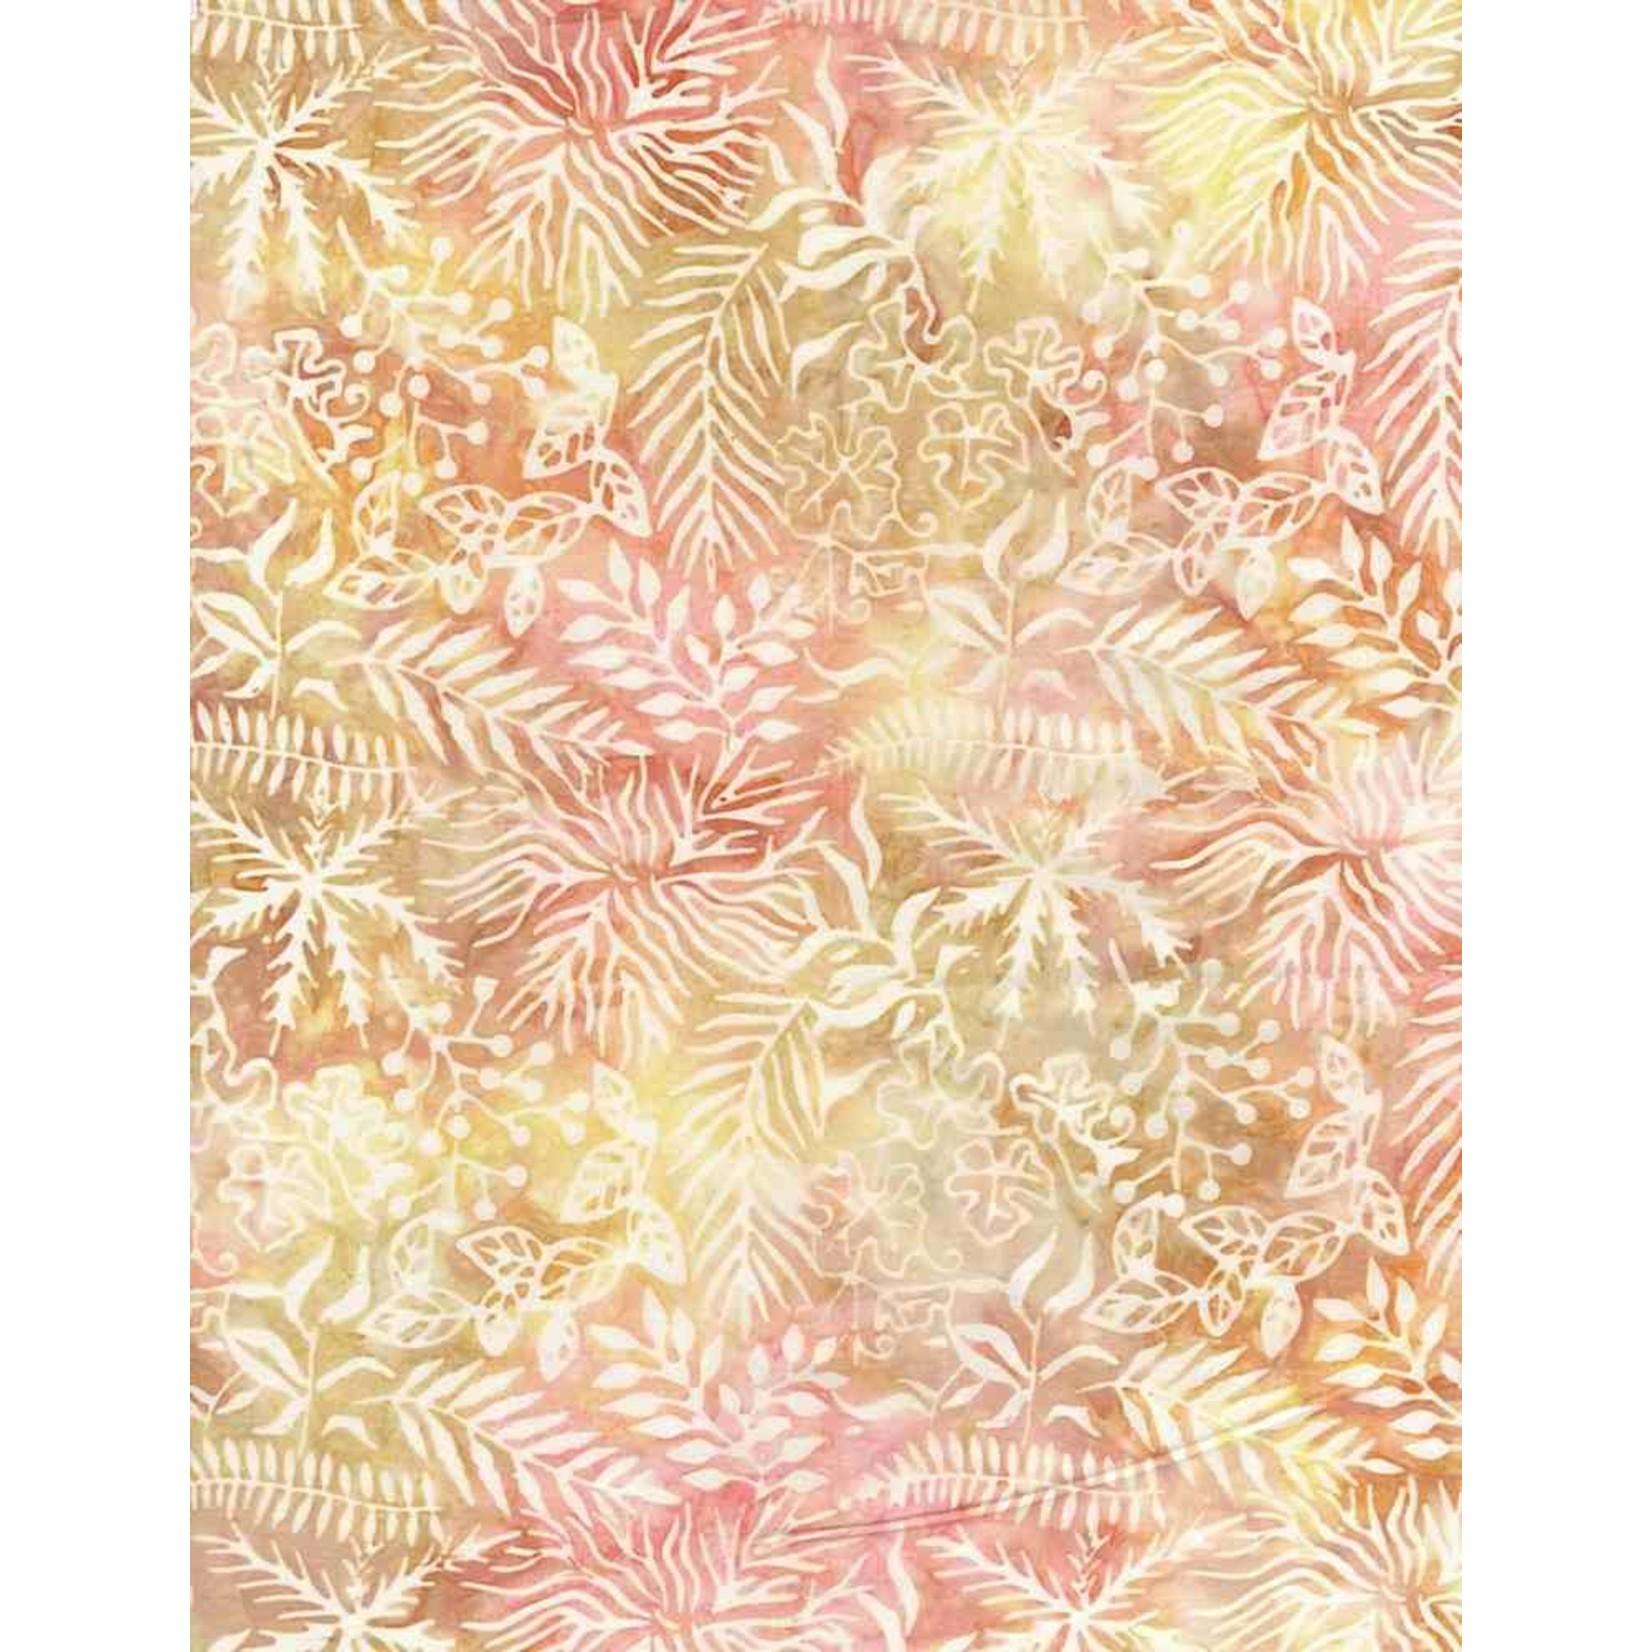 Tonga TONGA HORIZON, Assorted Leaves Sunrise- PER CM OR $20/M BATIK